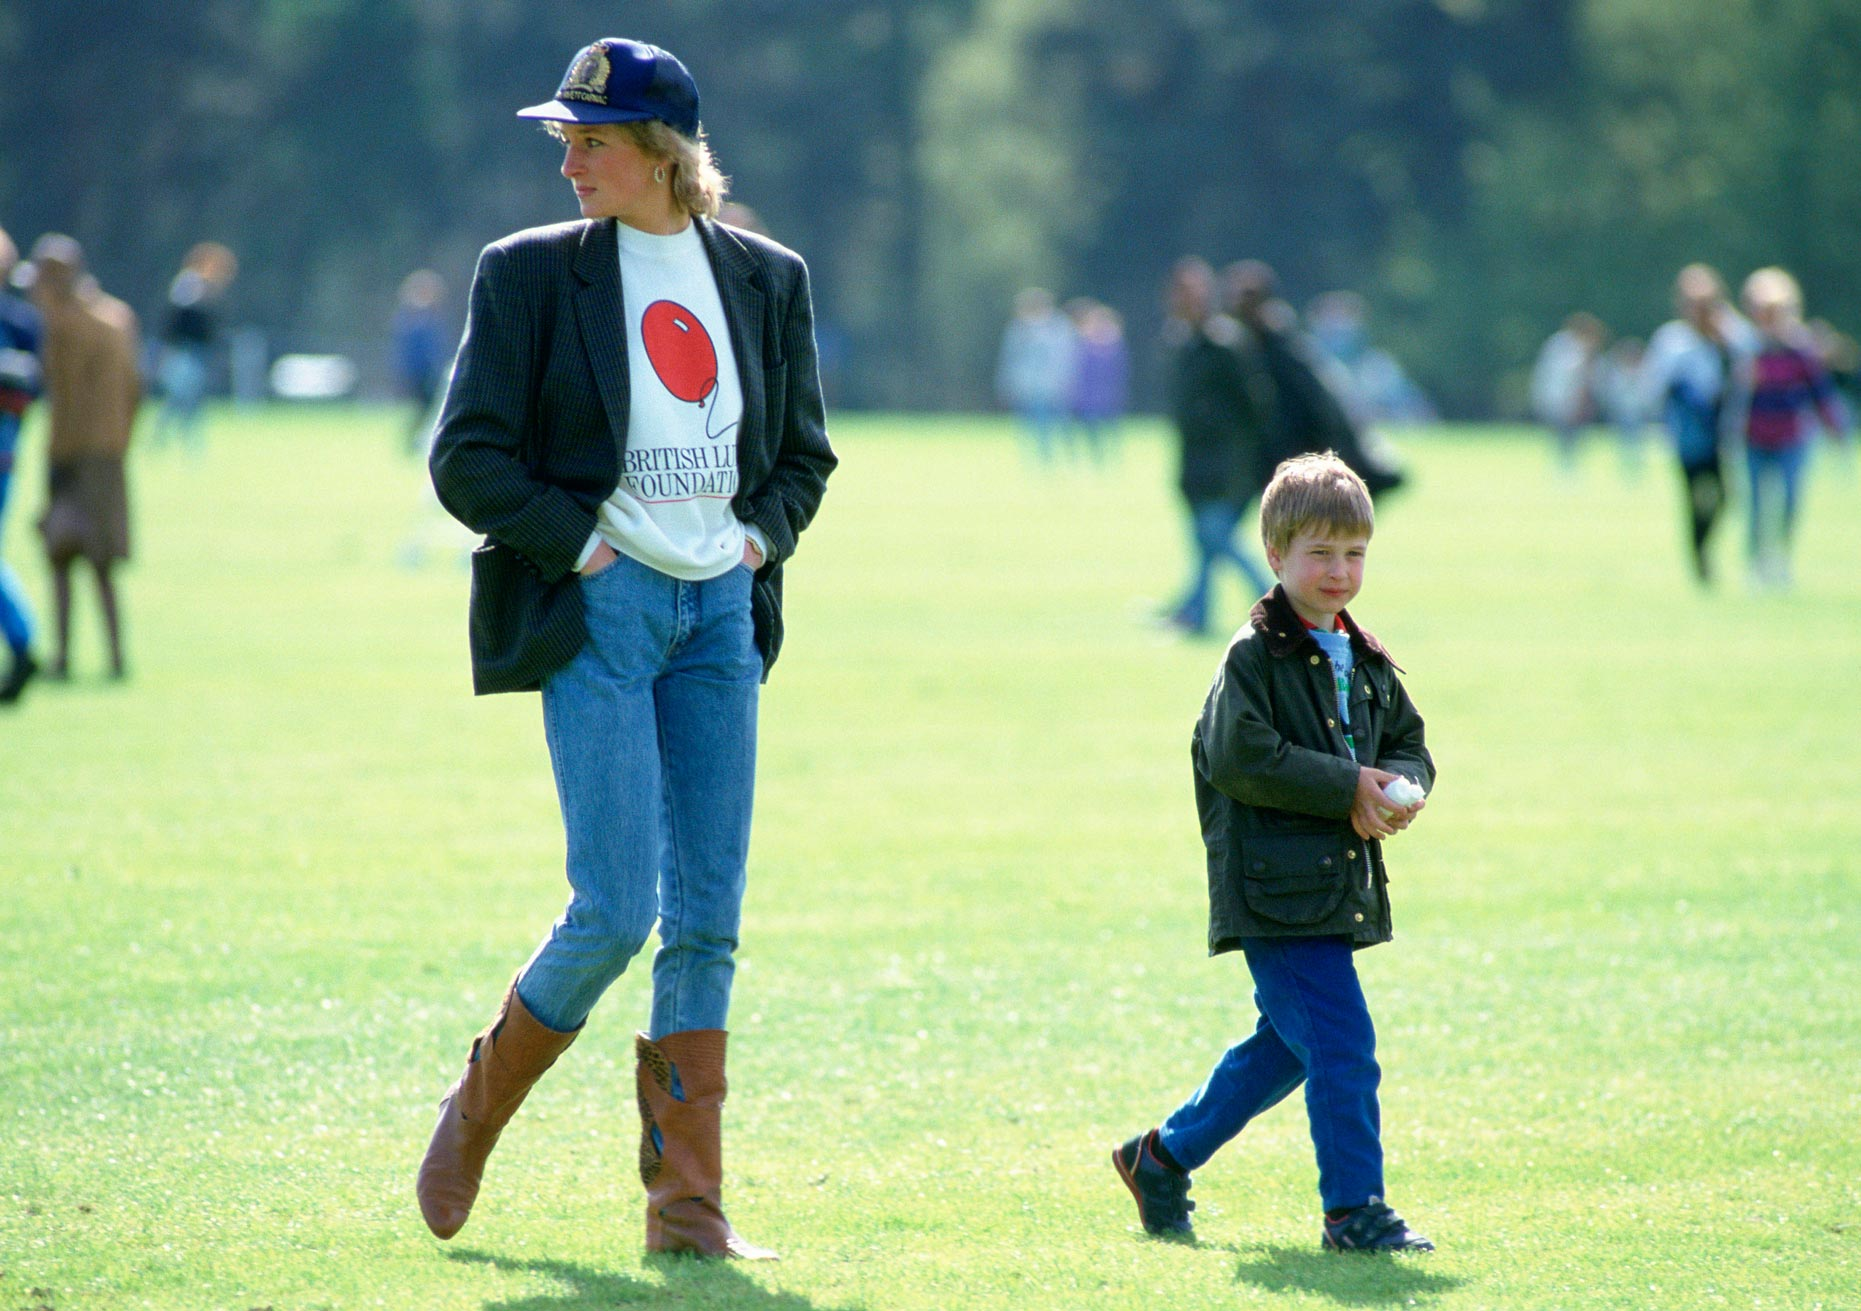 Диана принцесса Уэльская и принц Уильям. Фото: Tim Graham Photo Library/Getty Images